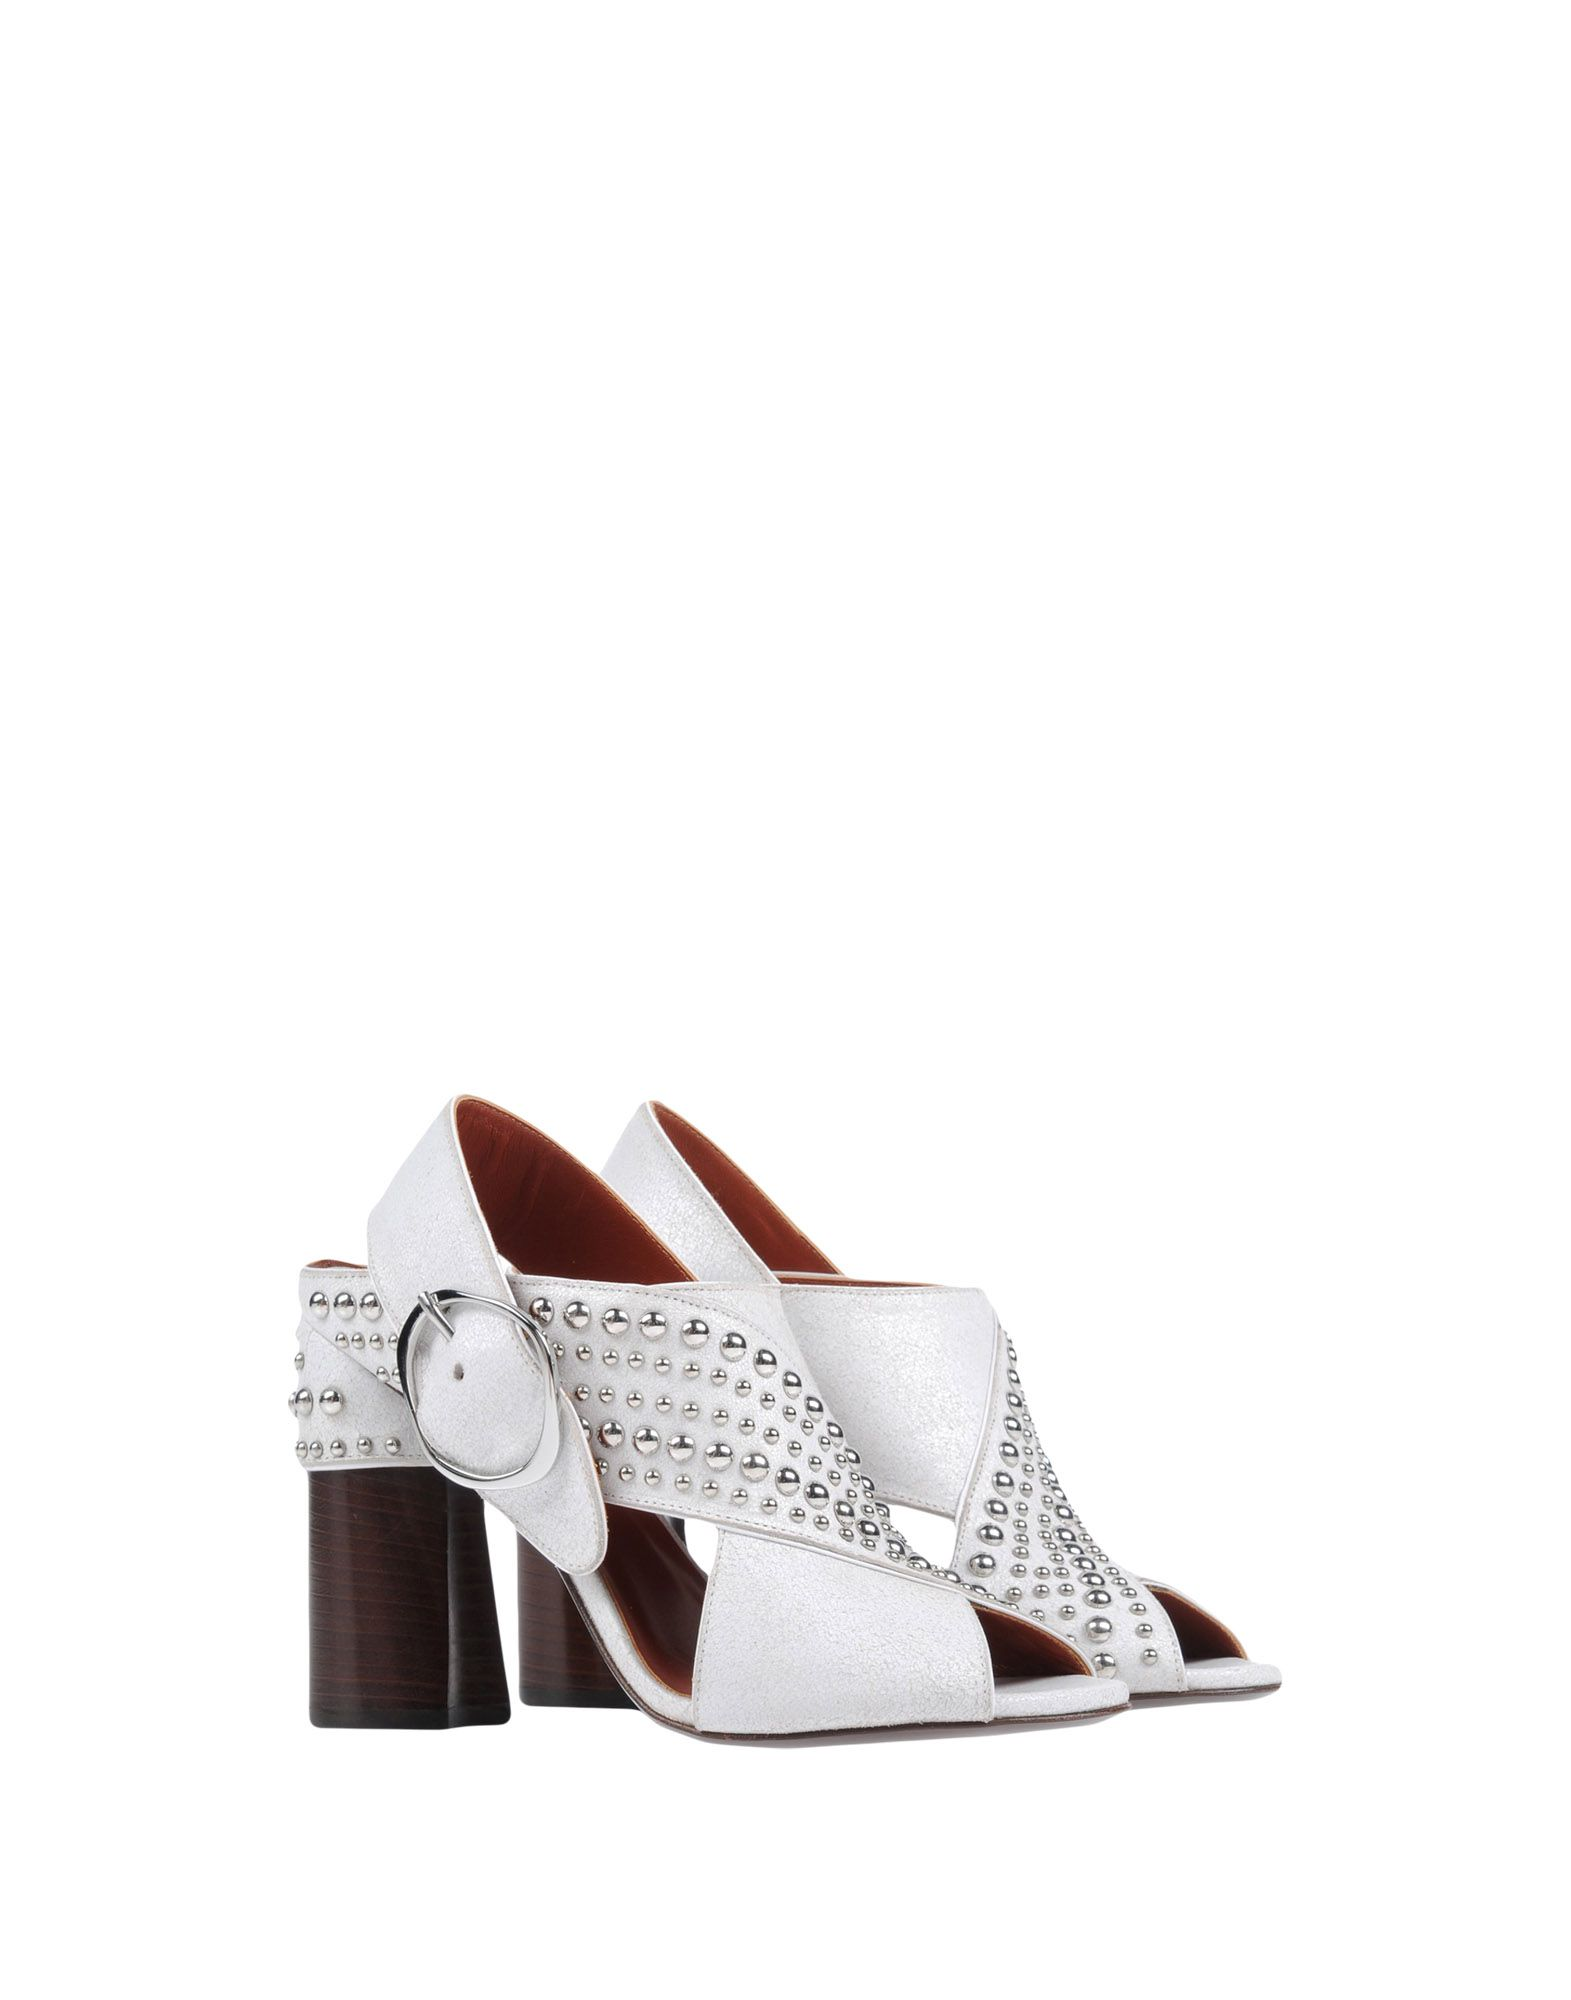 Stilvolle billige Sandalen Schuhe 3.1 Phillip Lim Sandalen billige Damen  11439200OA b2d2d2